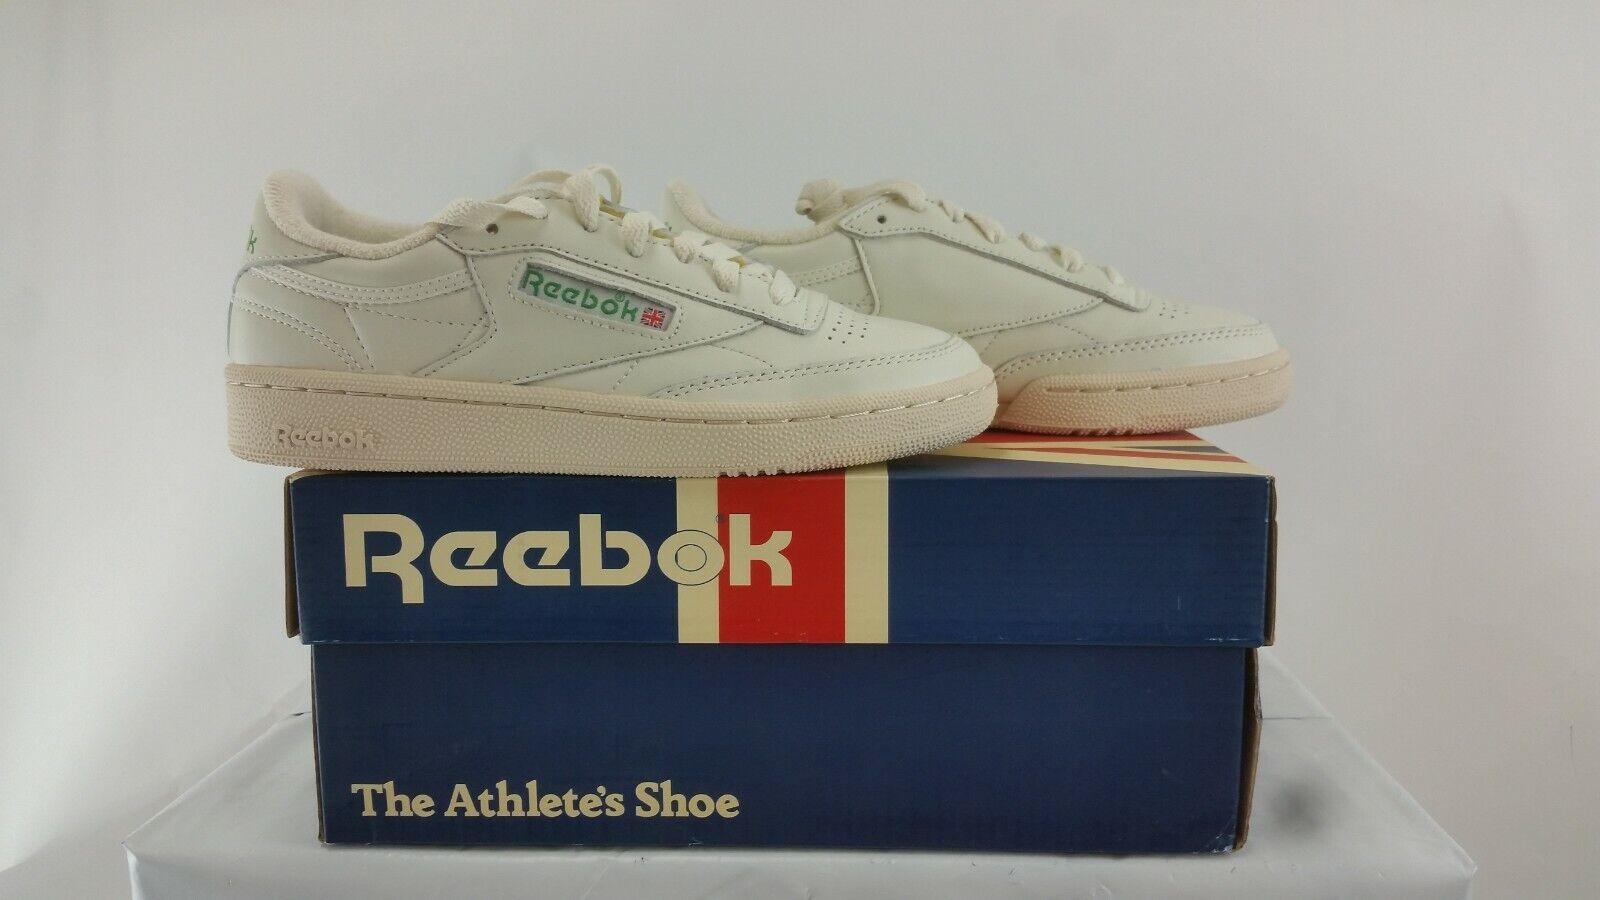 Chaise longue muestra tinción  Reebok Women's Club C 85 Diamond Fashion Sneaker 11 B(m) US White/gum for  sale online | eBay